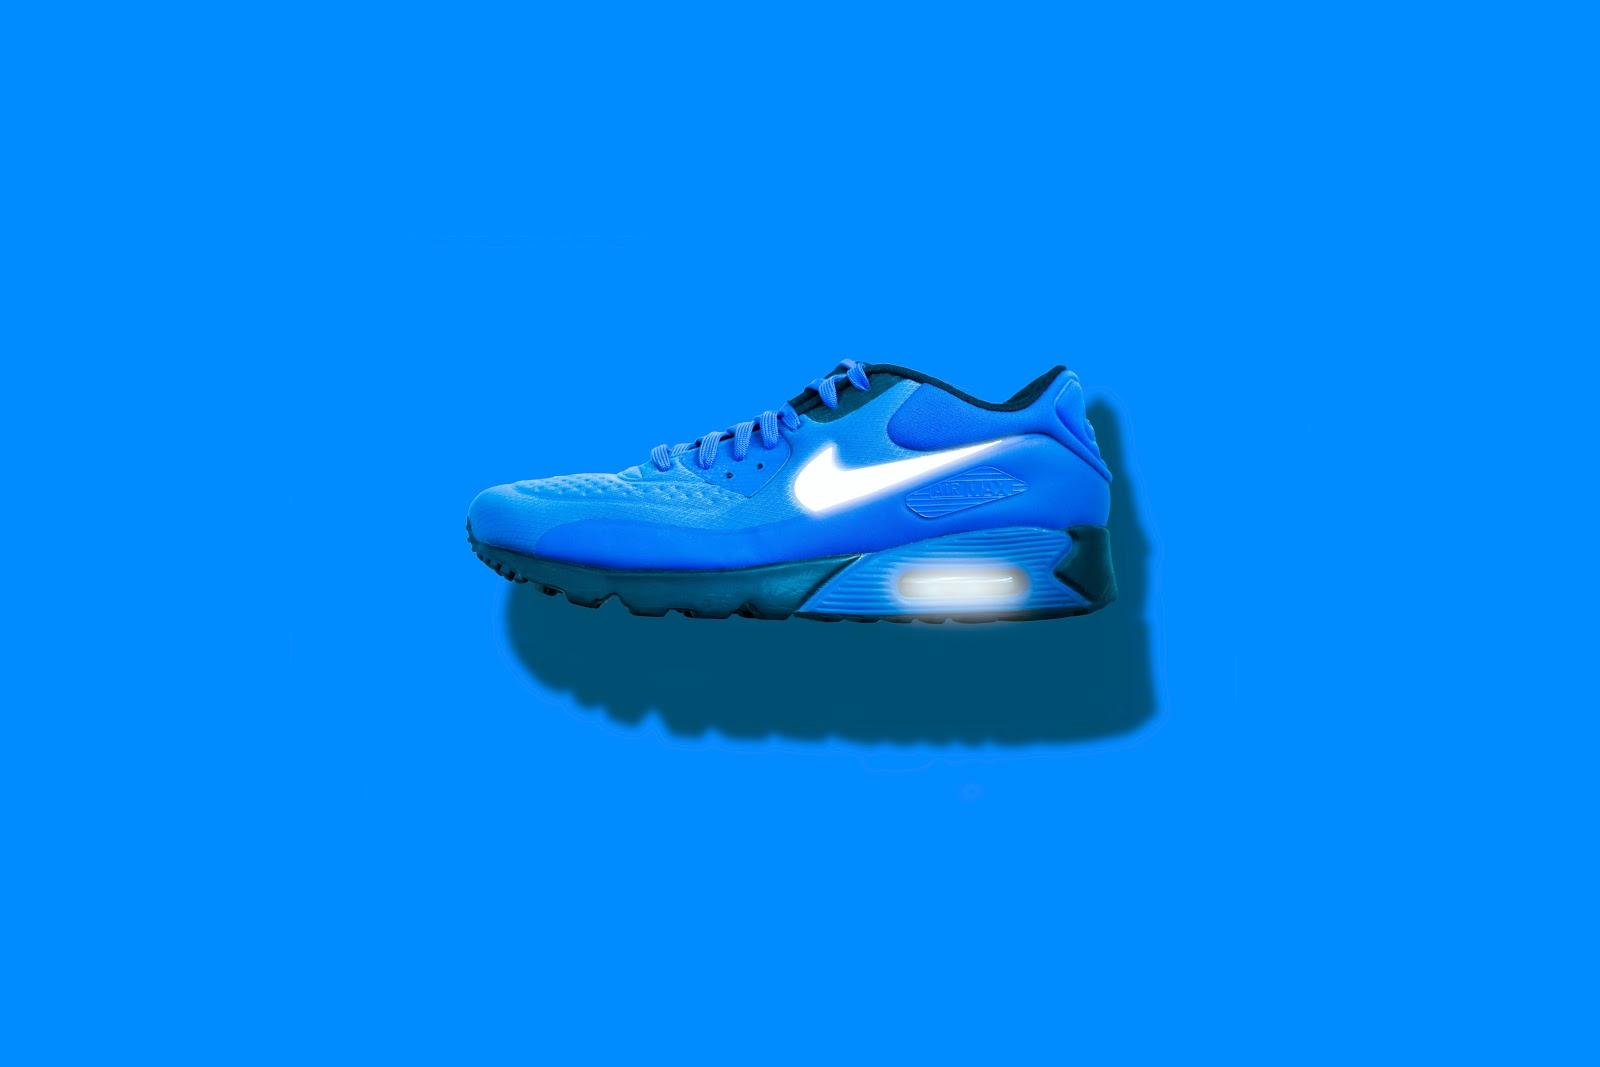 Blue Nike Shoe over blue background